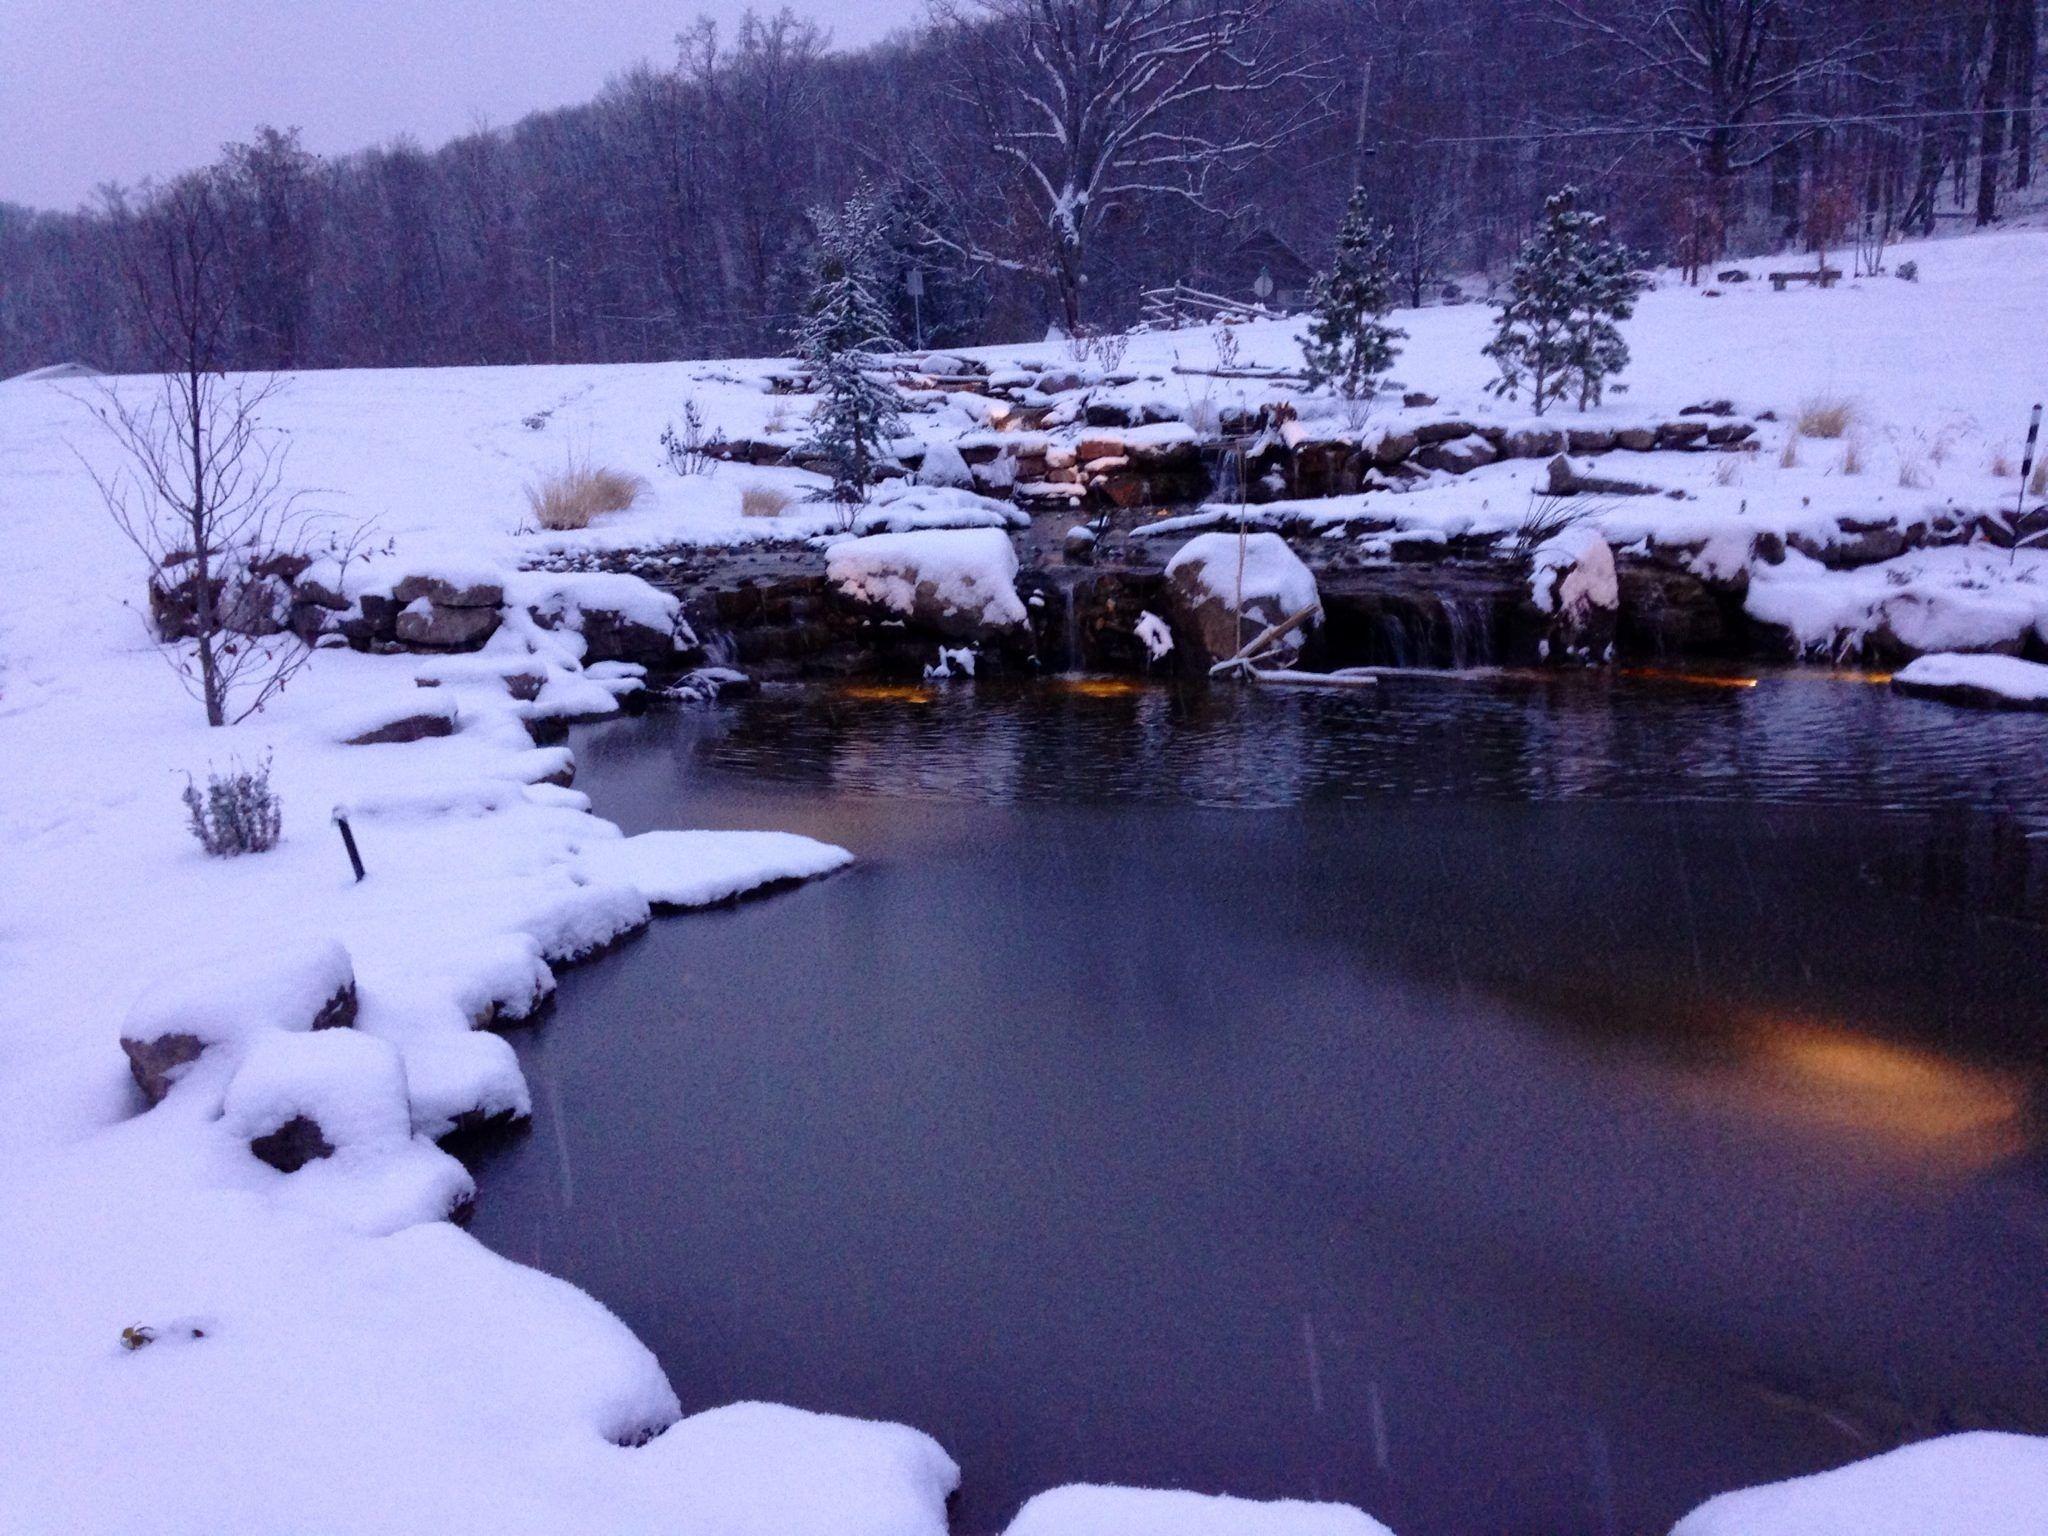 Diy Pond Winter Leaf Cover Build Diy Pond Ponds Backyard Pond Covers